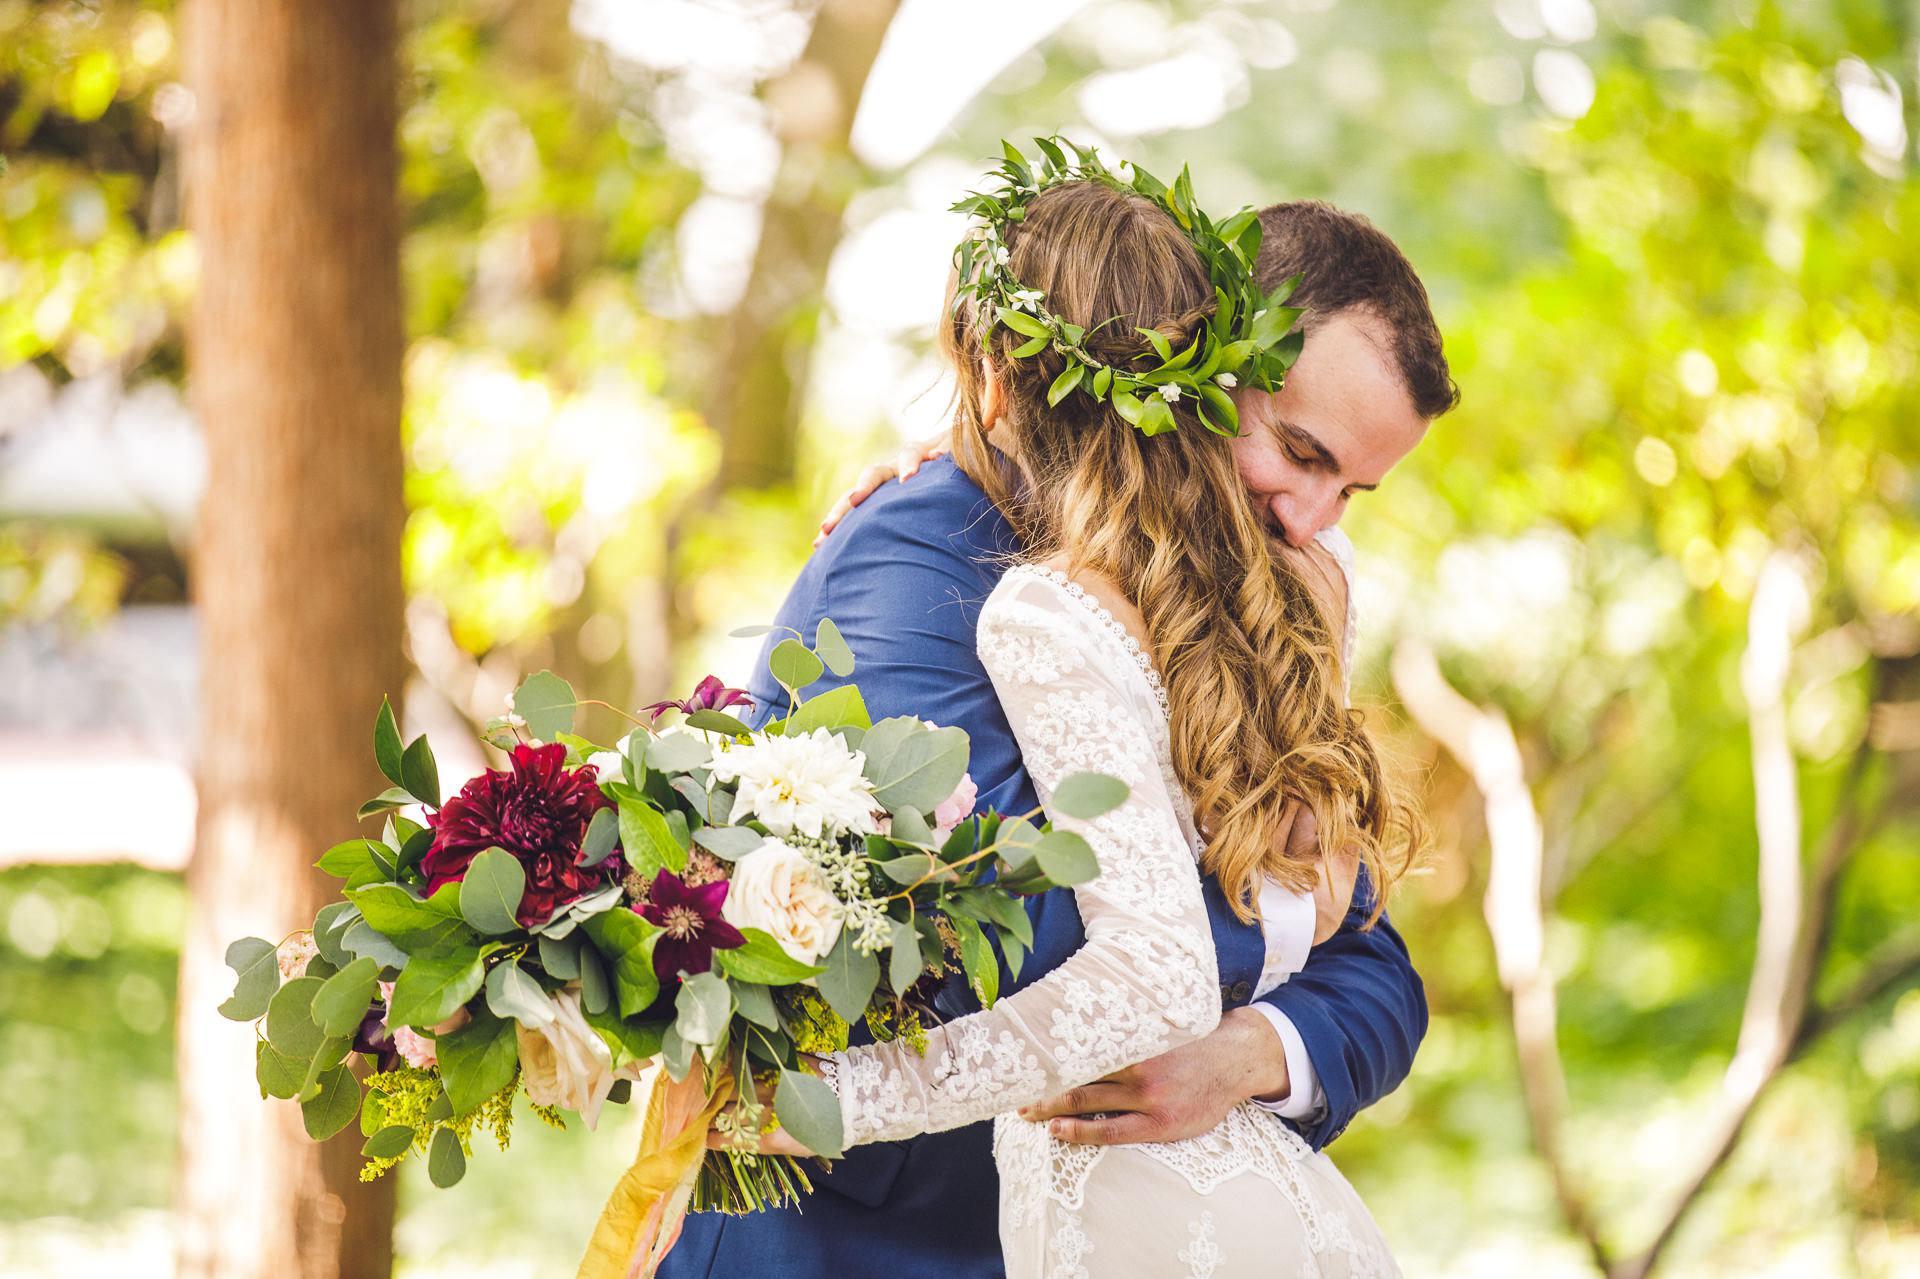 Ariel International Center Wedding Photographer in Cleveland 3.jpg